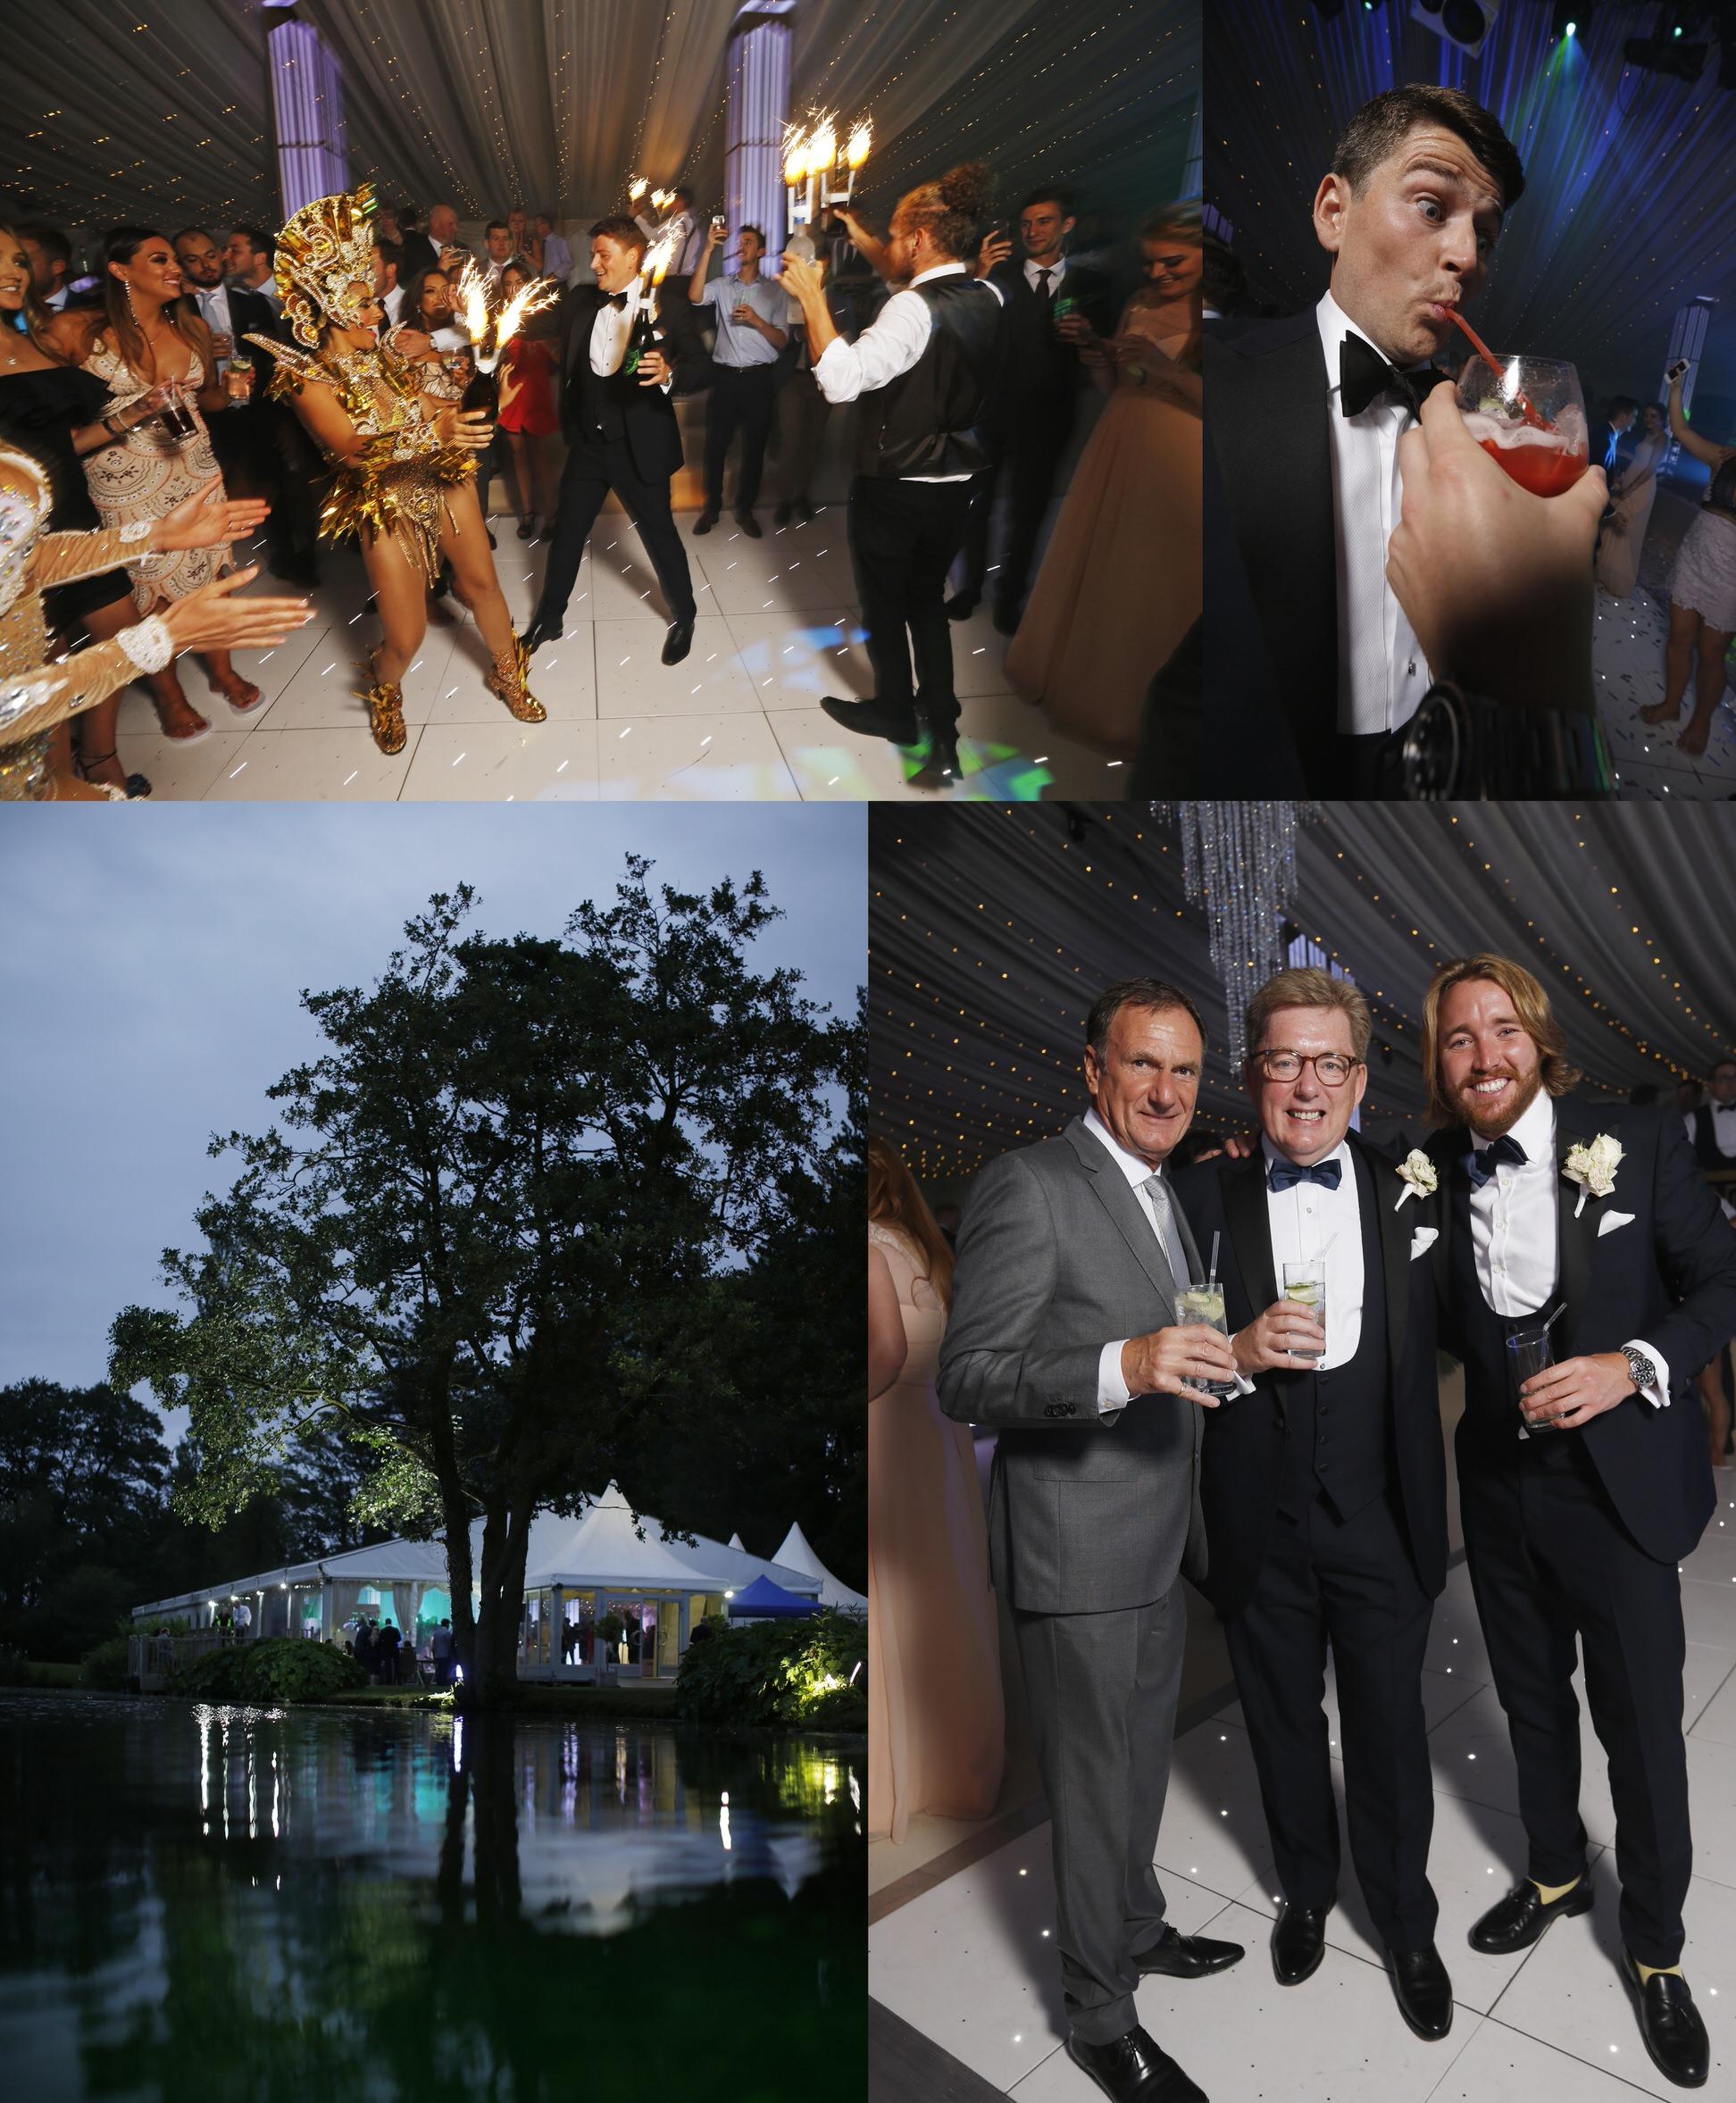 cheshire-wedding-photographer-thornton-manor-weddings_0031.jpg